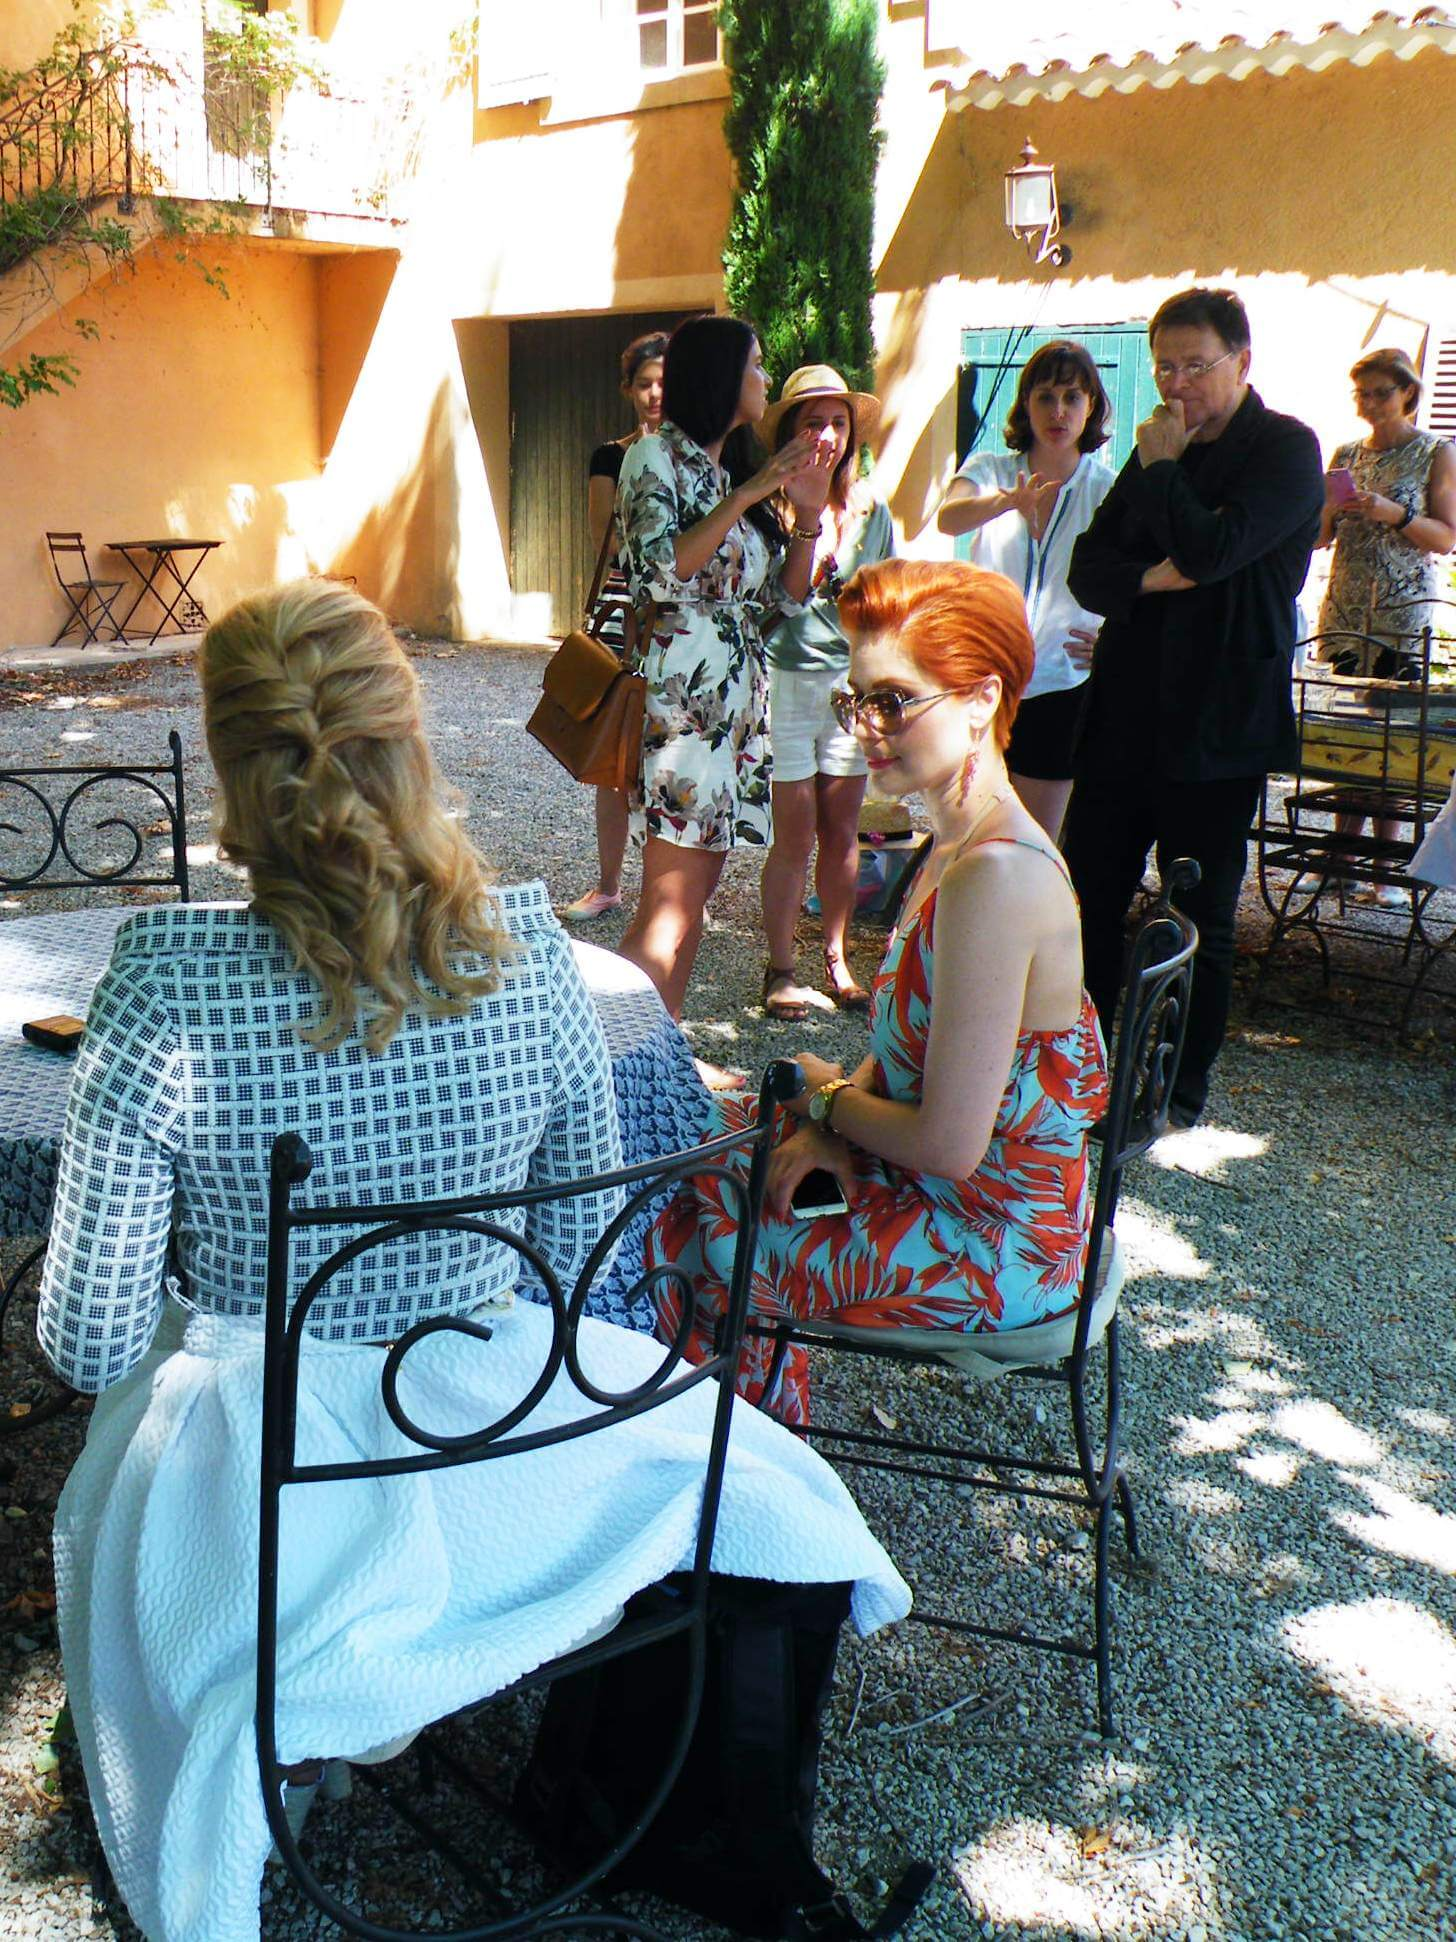 Szonja Oroszlán, Barbara Orosz and Olivier Baussan before a scene